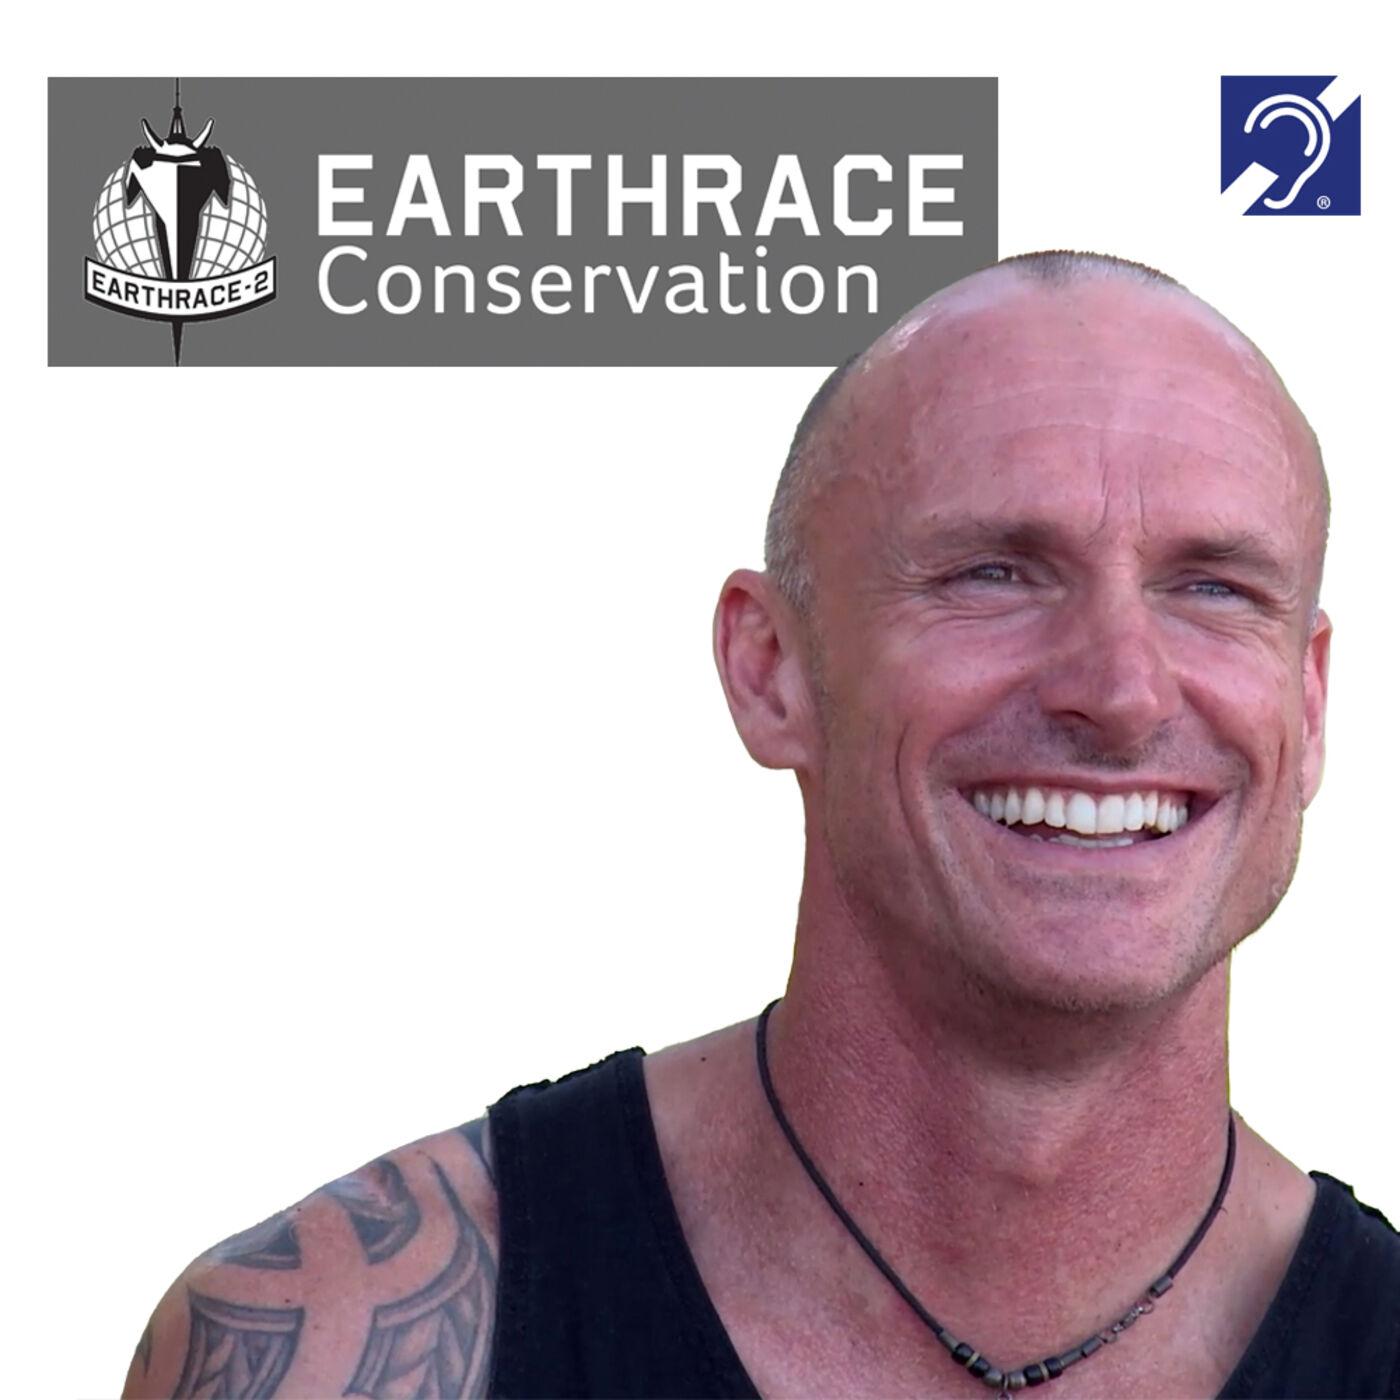 Pete Bethune - Earthrace conservation - S2 E02